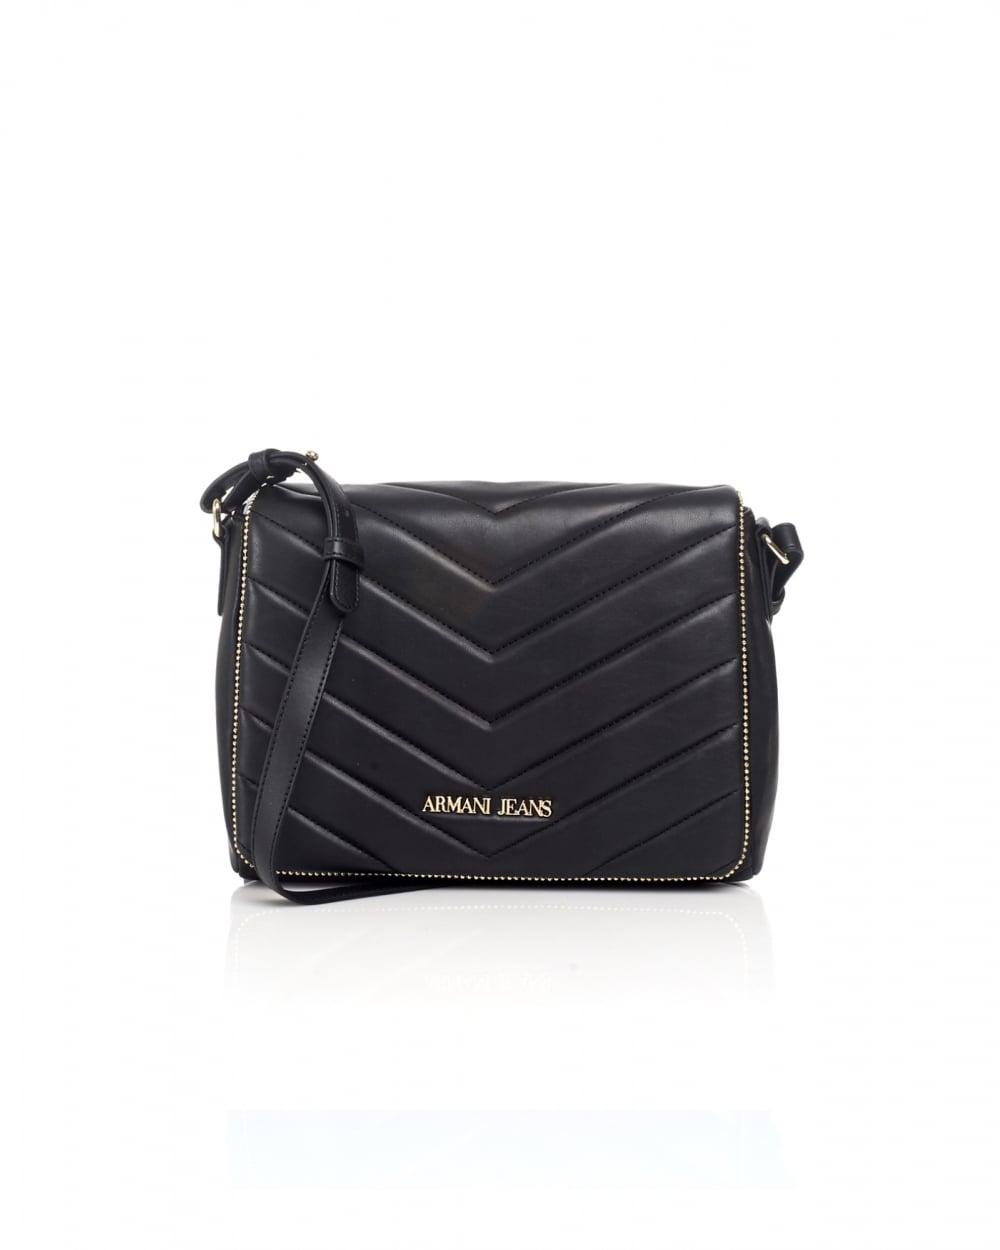 Excellent New Women Lorenz Real Leather Messenger Shoulder Across Body Bag Handbag Black | EBay